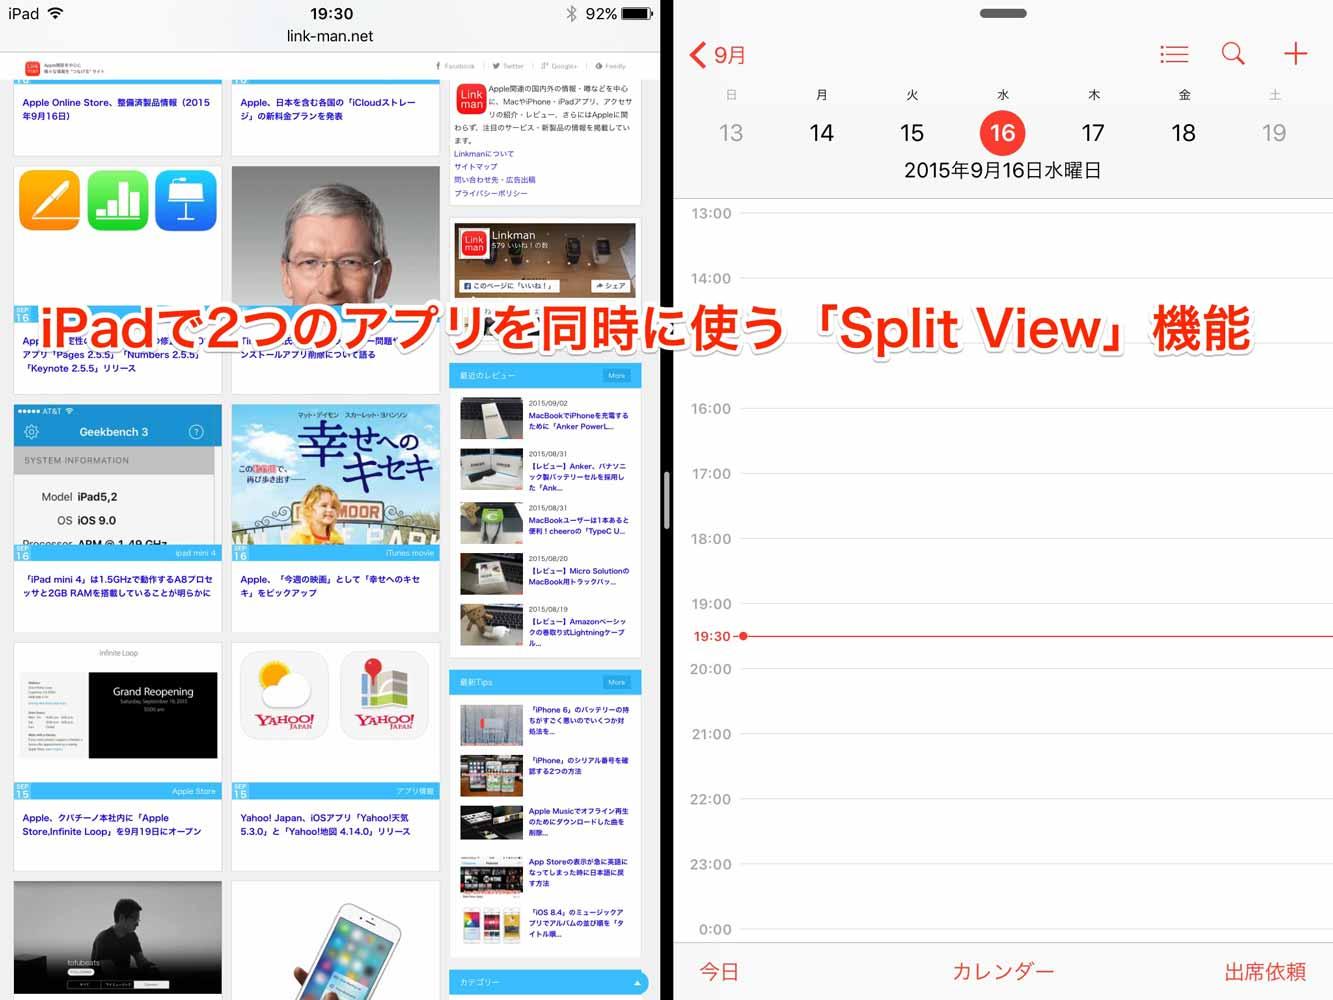 iOS 9の新機能:iPadで2つのアプリを同時に使う「Split View」機能